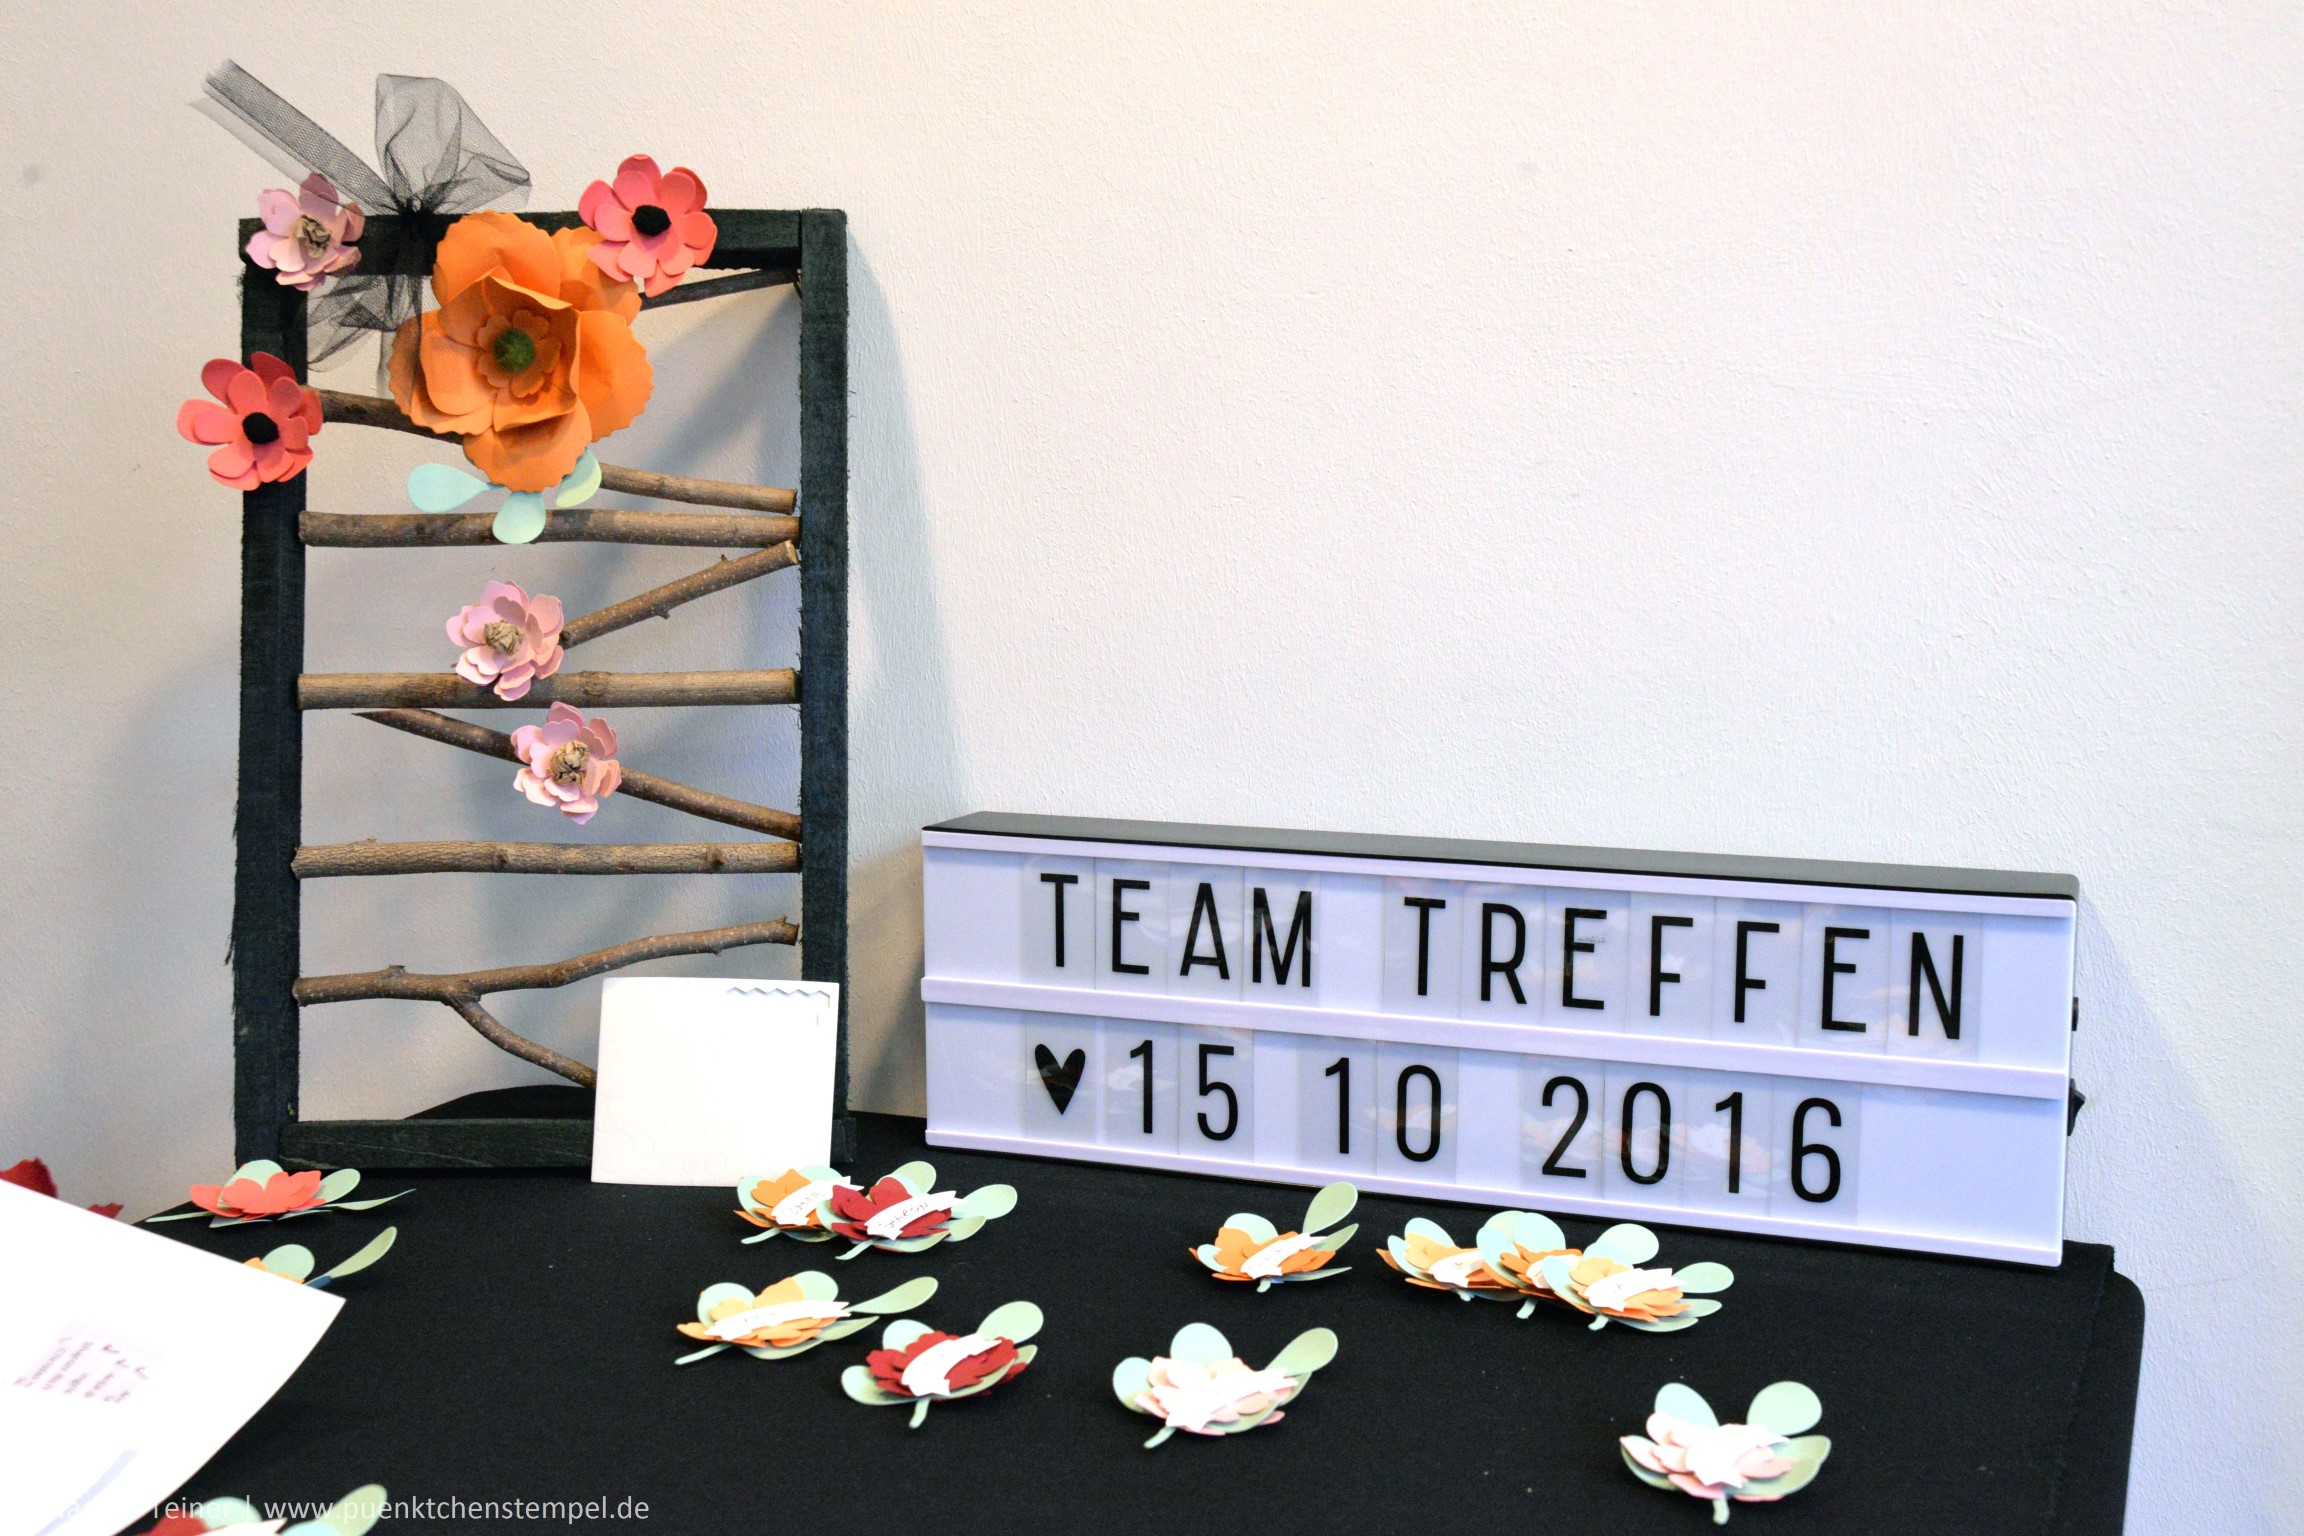 Teamtreffen Oktober 2016 www.puenktchenstempel.de